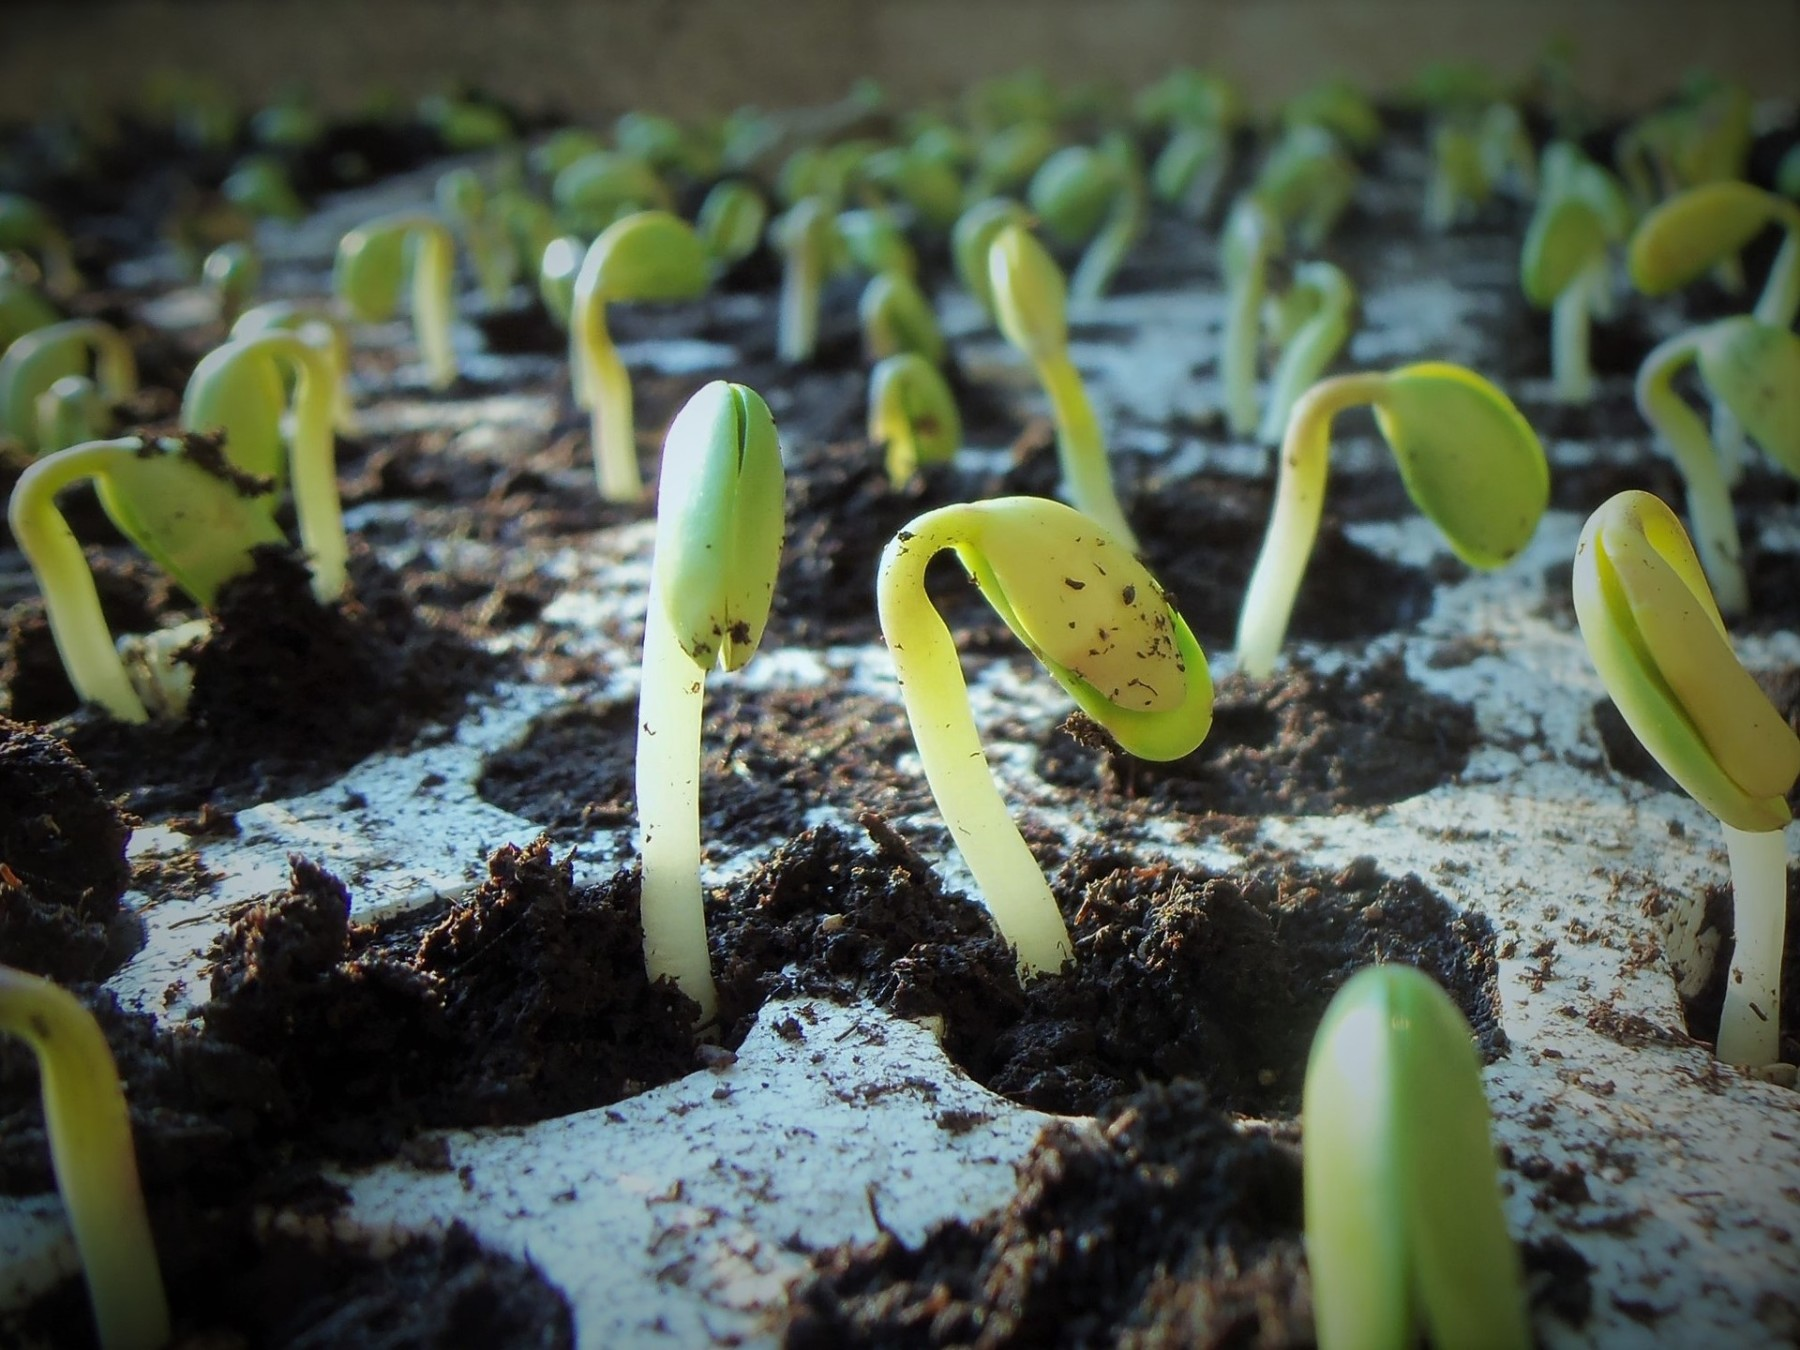 plants-1331667_1920